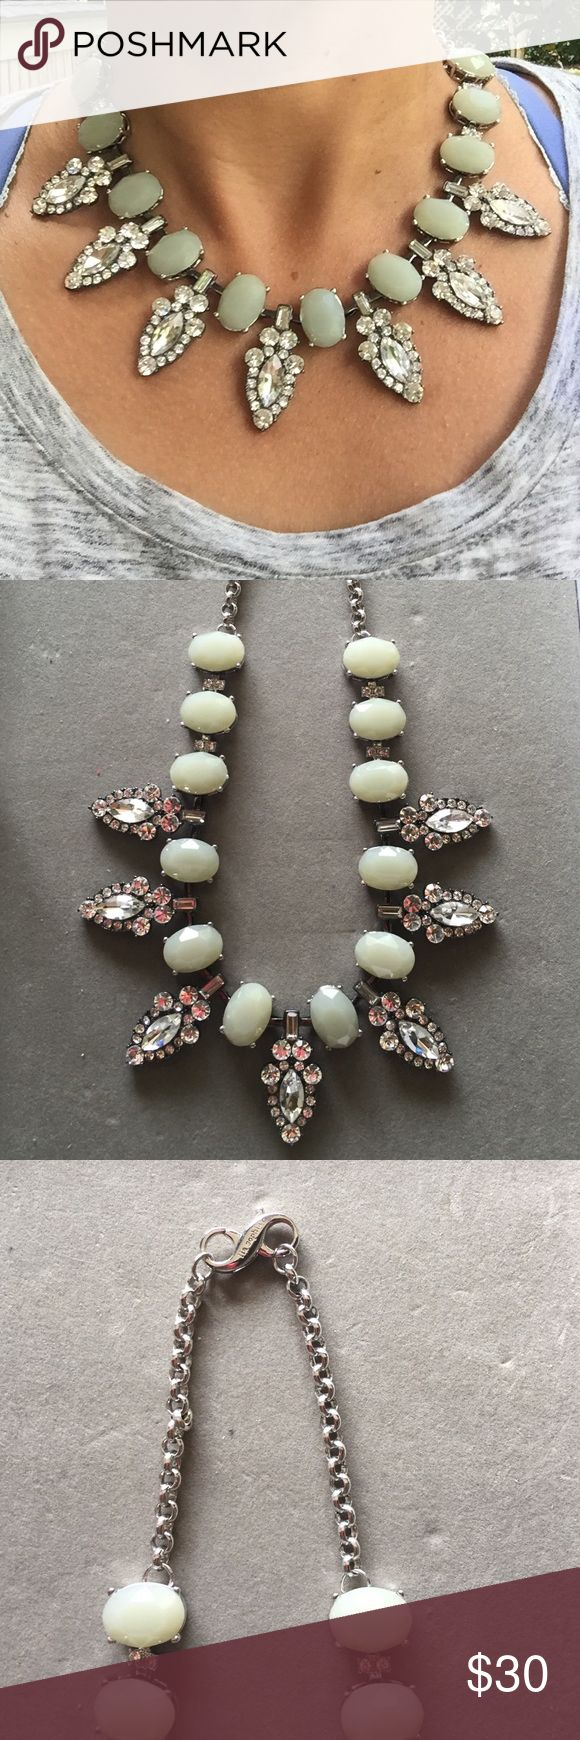 Lia Sophia necklace statement piece necklace by Lia Sophia Lia Sophia Jewelry Necklaces